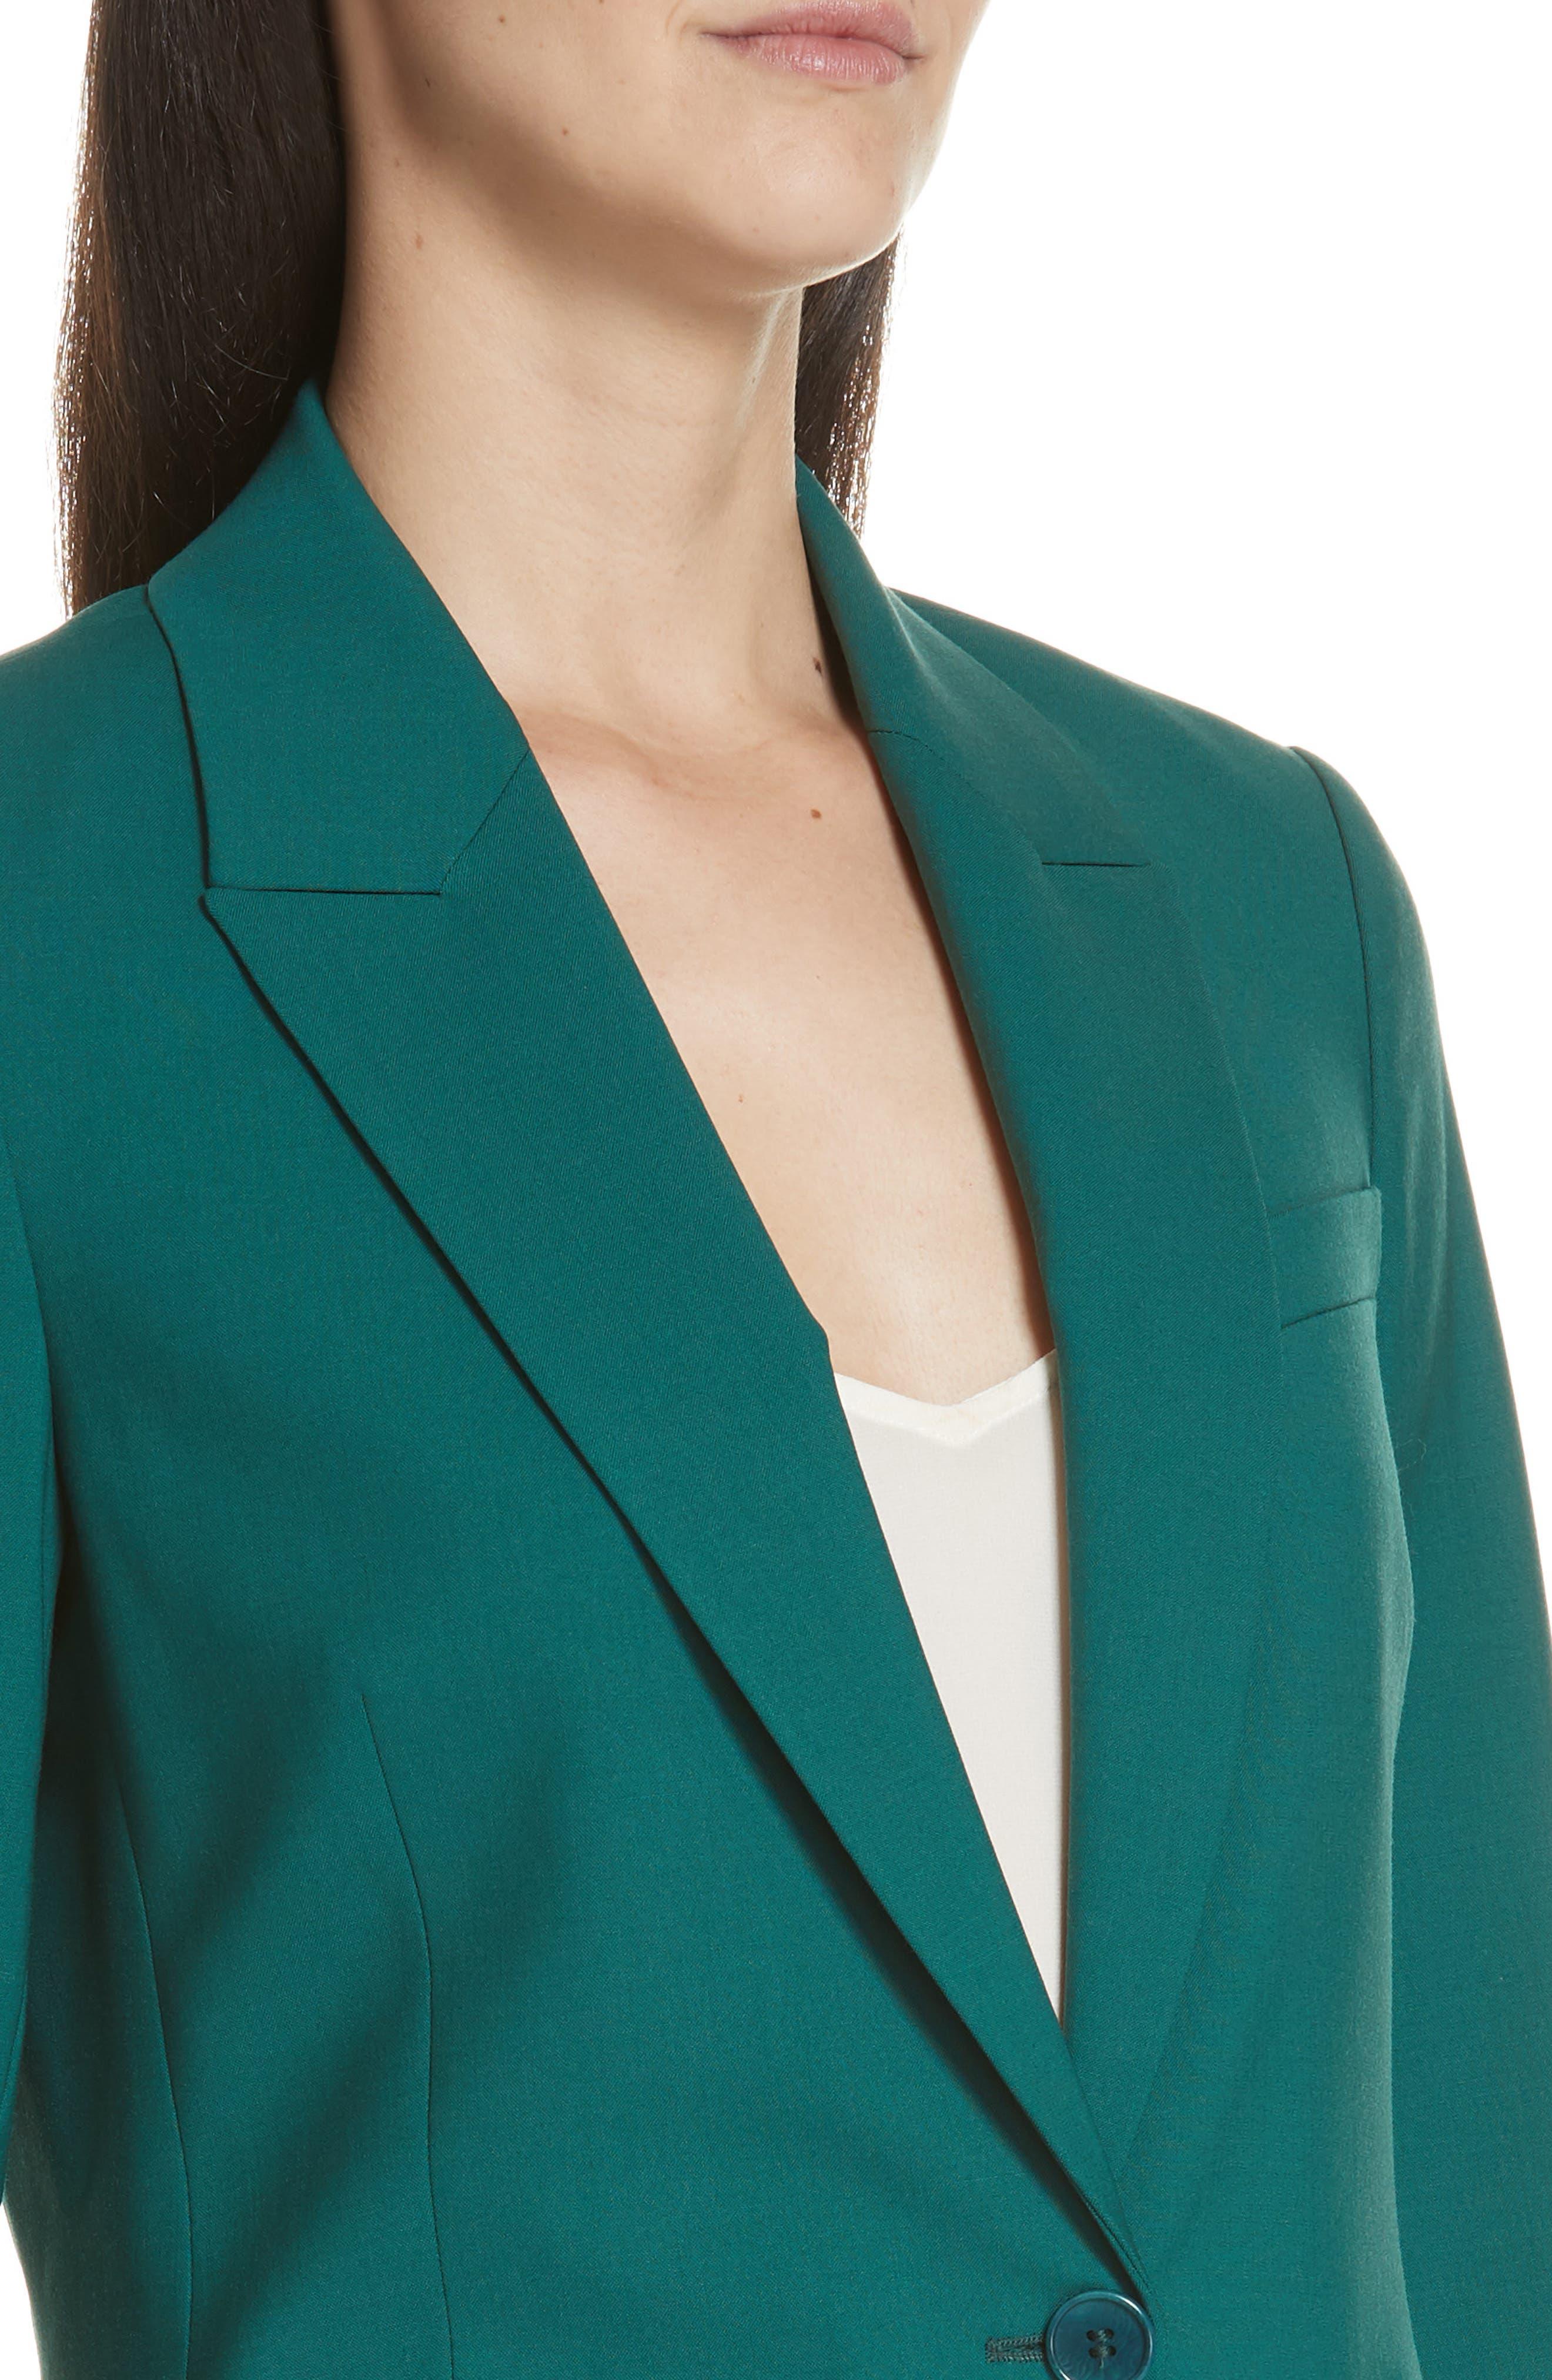 Etienette B Good Wool Suit Jacket,                             Alternate thumbnail 26, color,